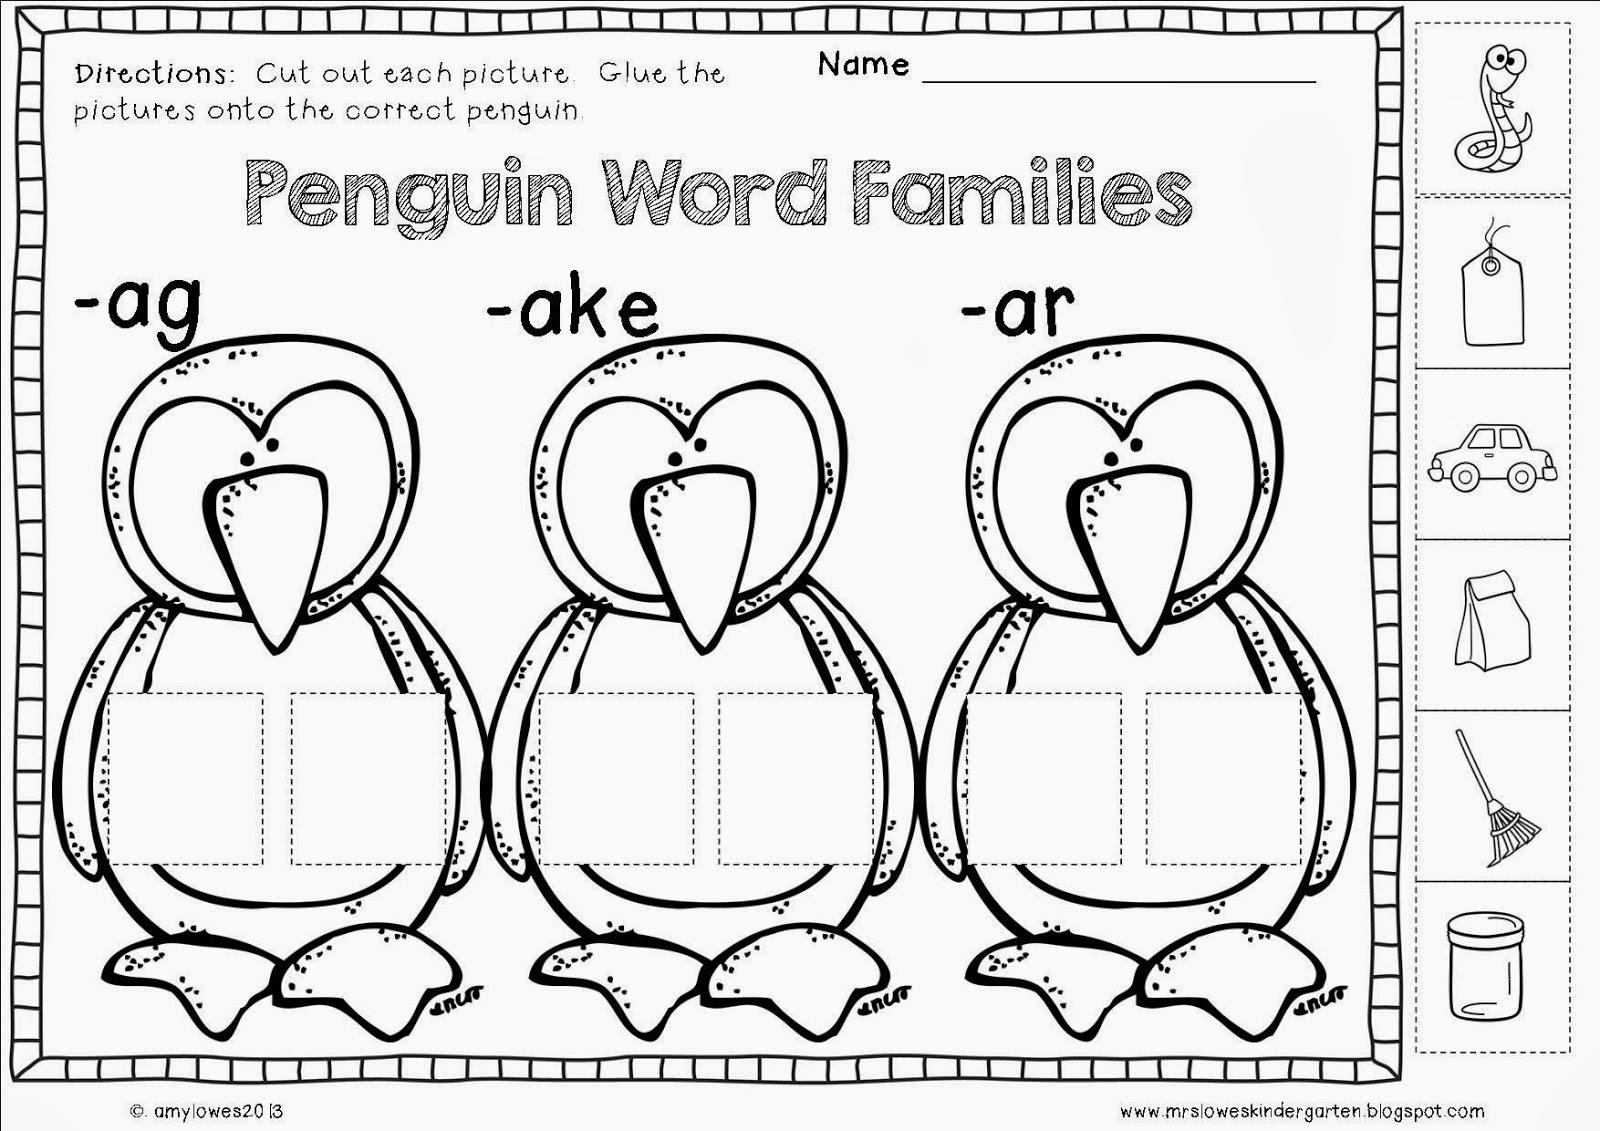 Mrs Lowes Kindergarten Korner No Prep Winter Math And Literacy Printables Giveaway